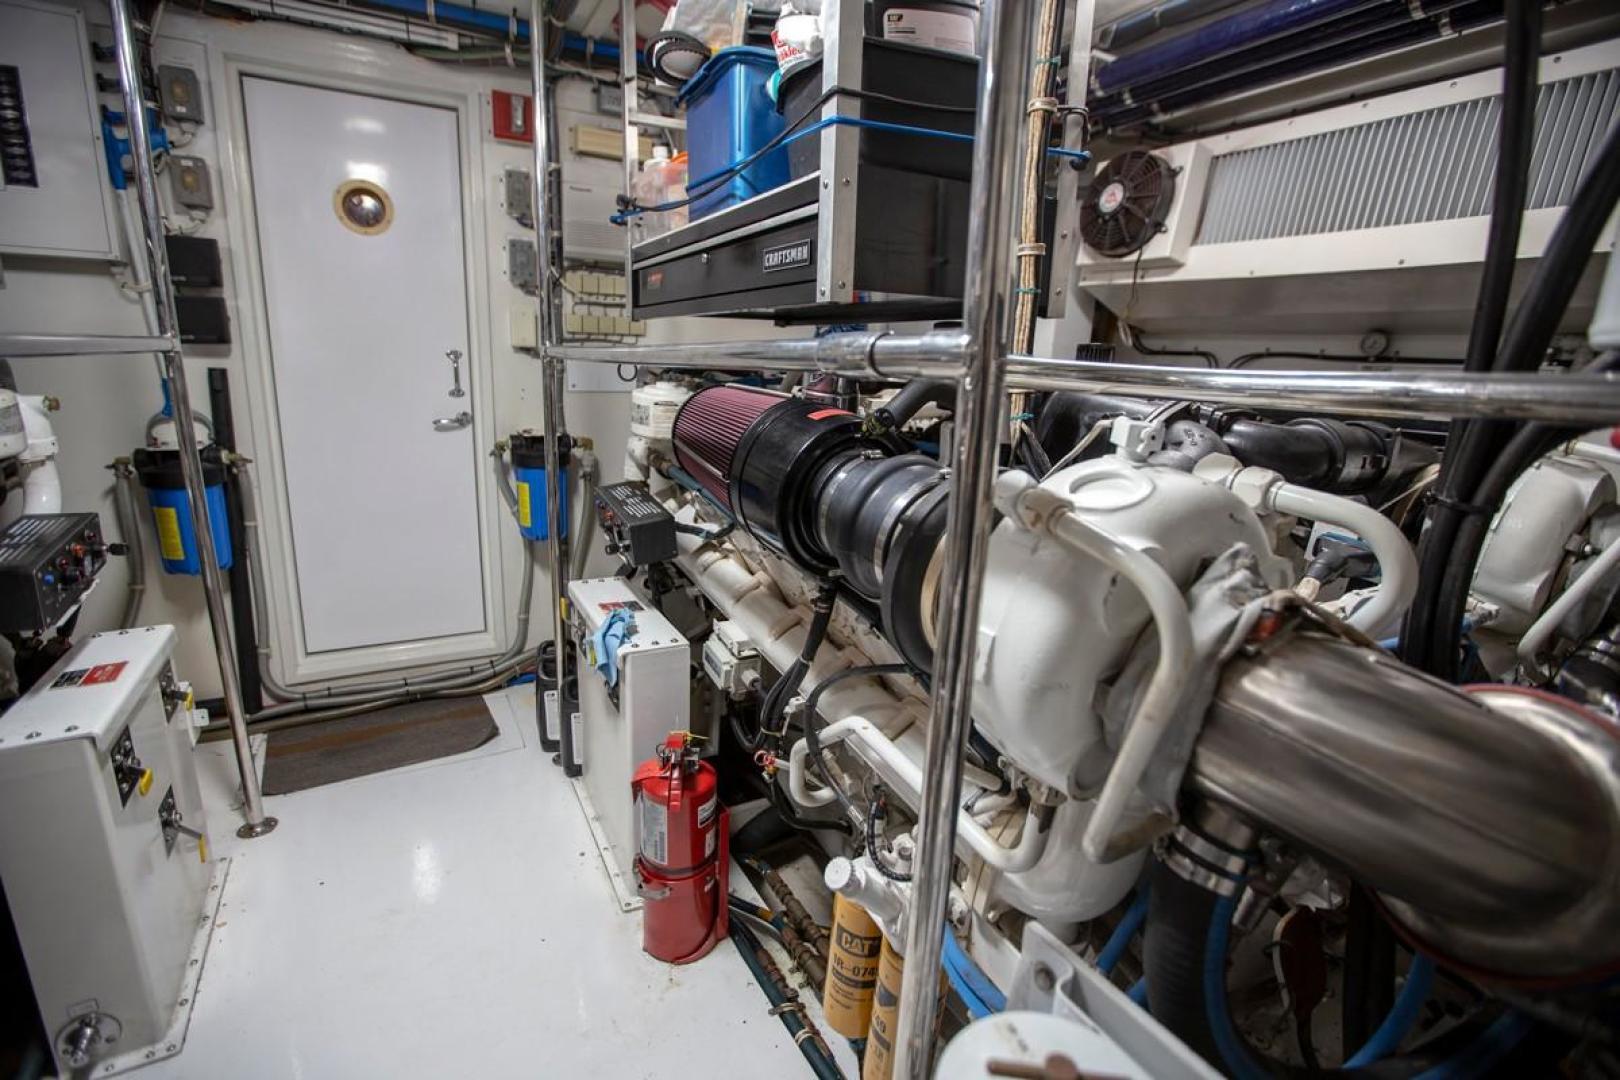 Hatteras-Cockpit Motor Yacht 2000-Getaway Ft. Lauderdale-Florida-United States-977382 | Thumbnail